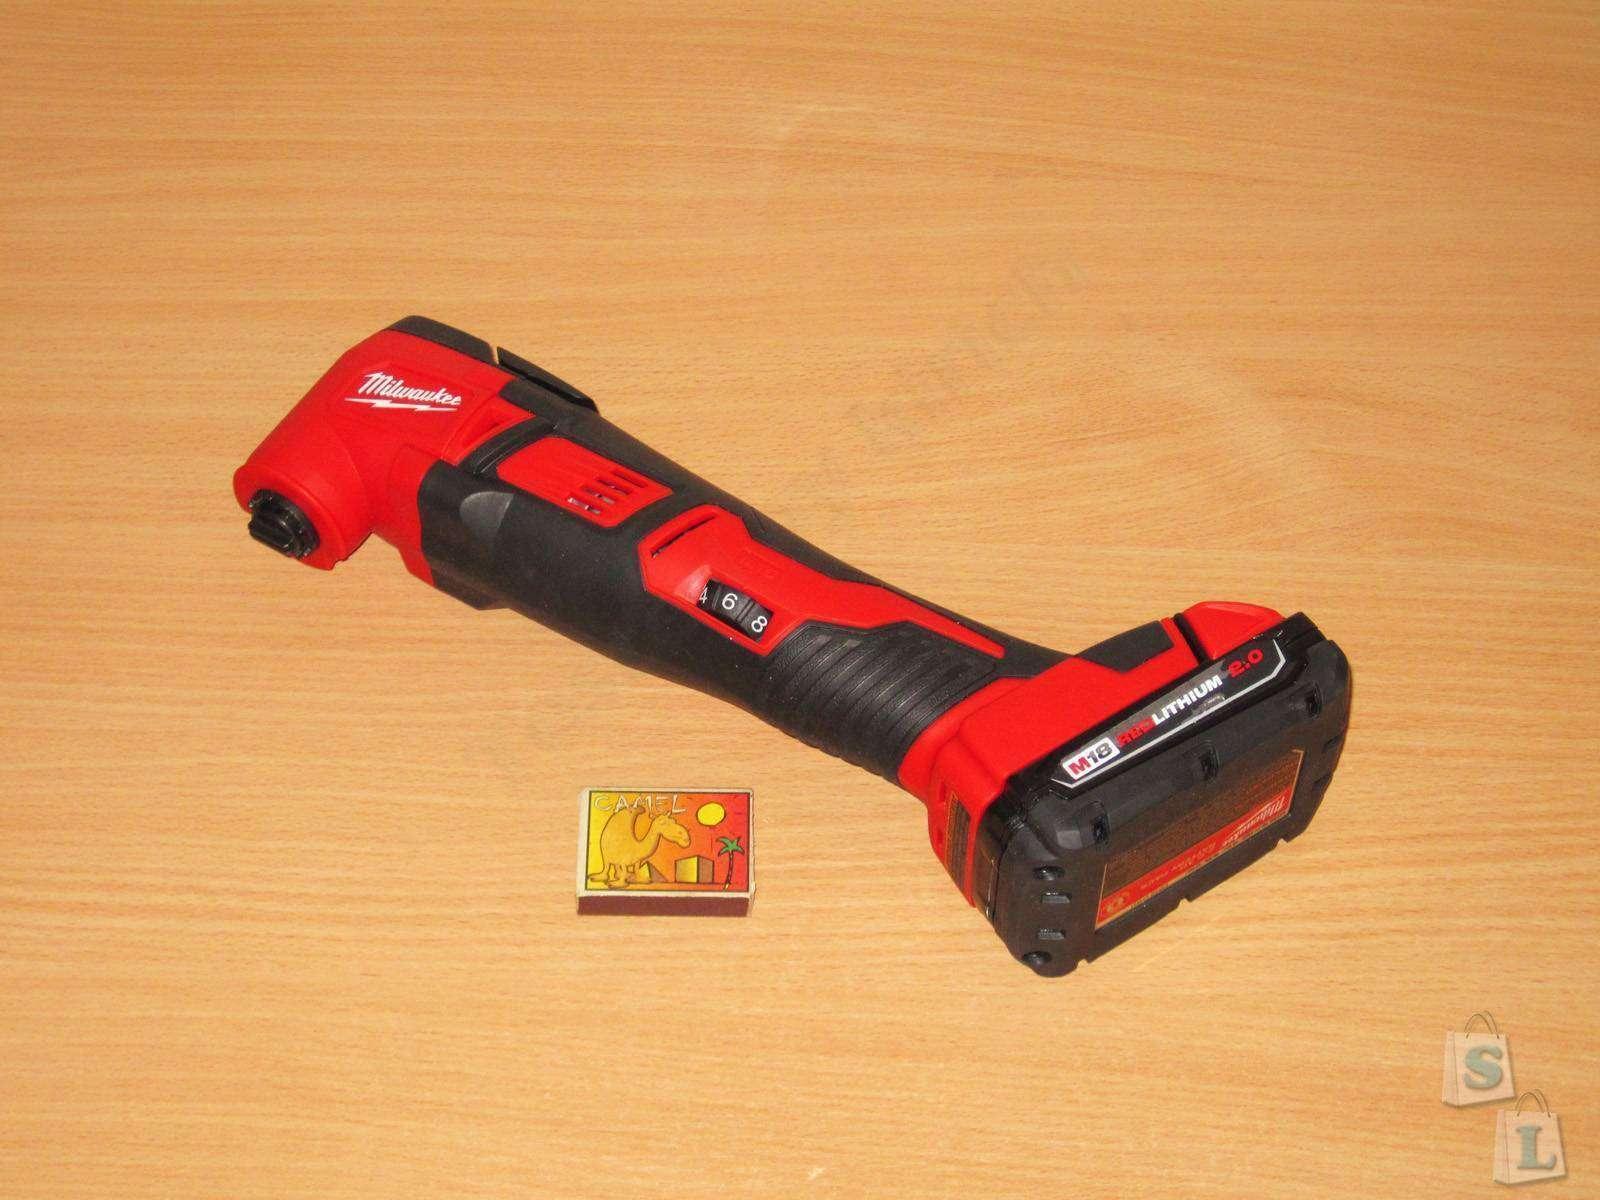 Ebay: Осцилляторная пила MILWAUKEE 2626-20 M18 CORDLESS MULTI-TOOL